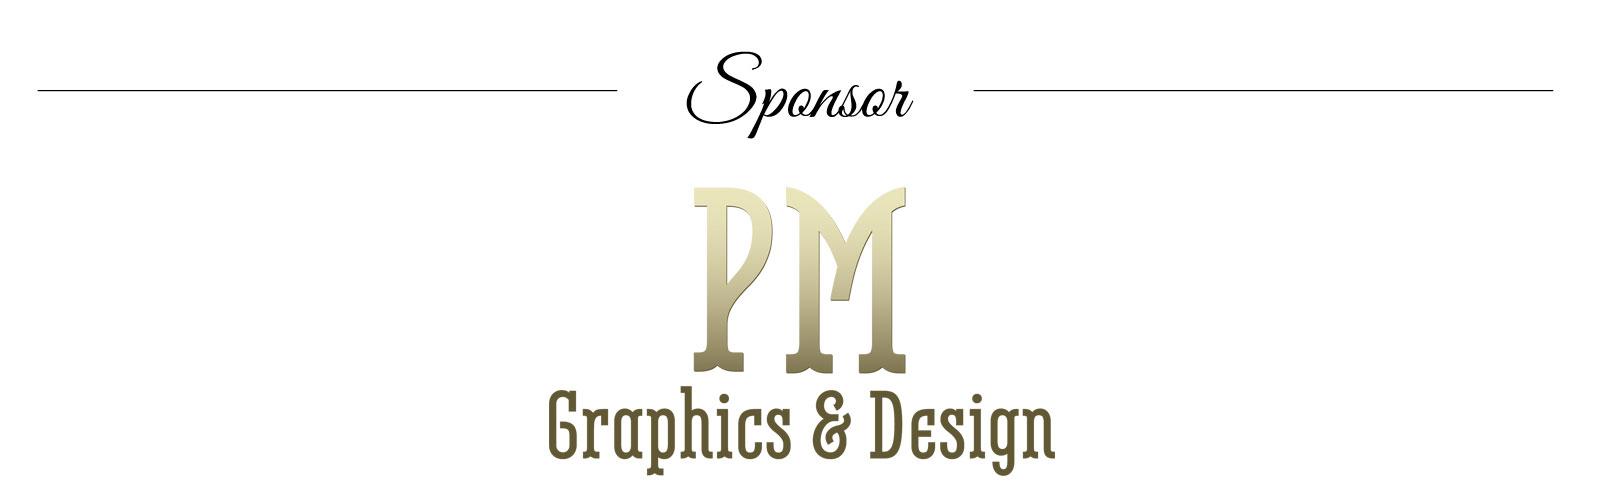 sponsor-PMgraphics